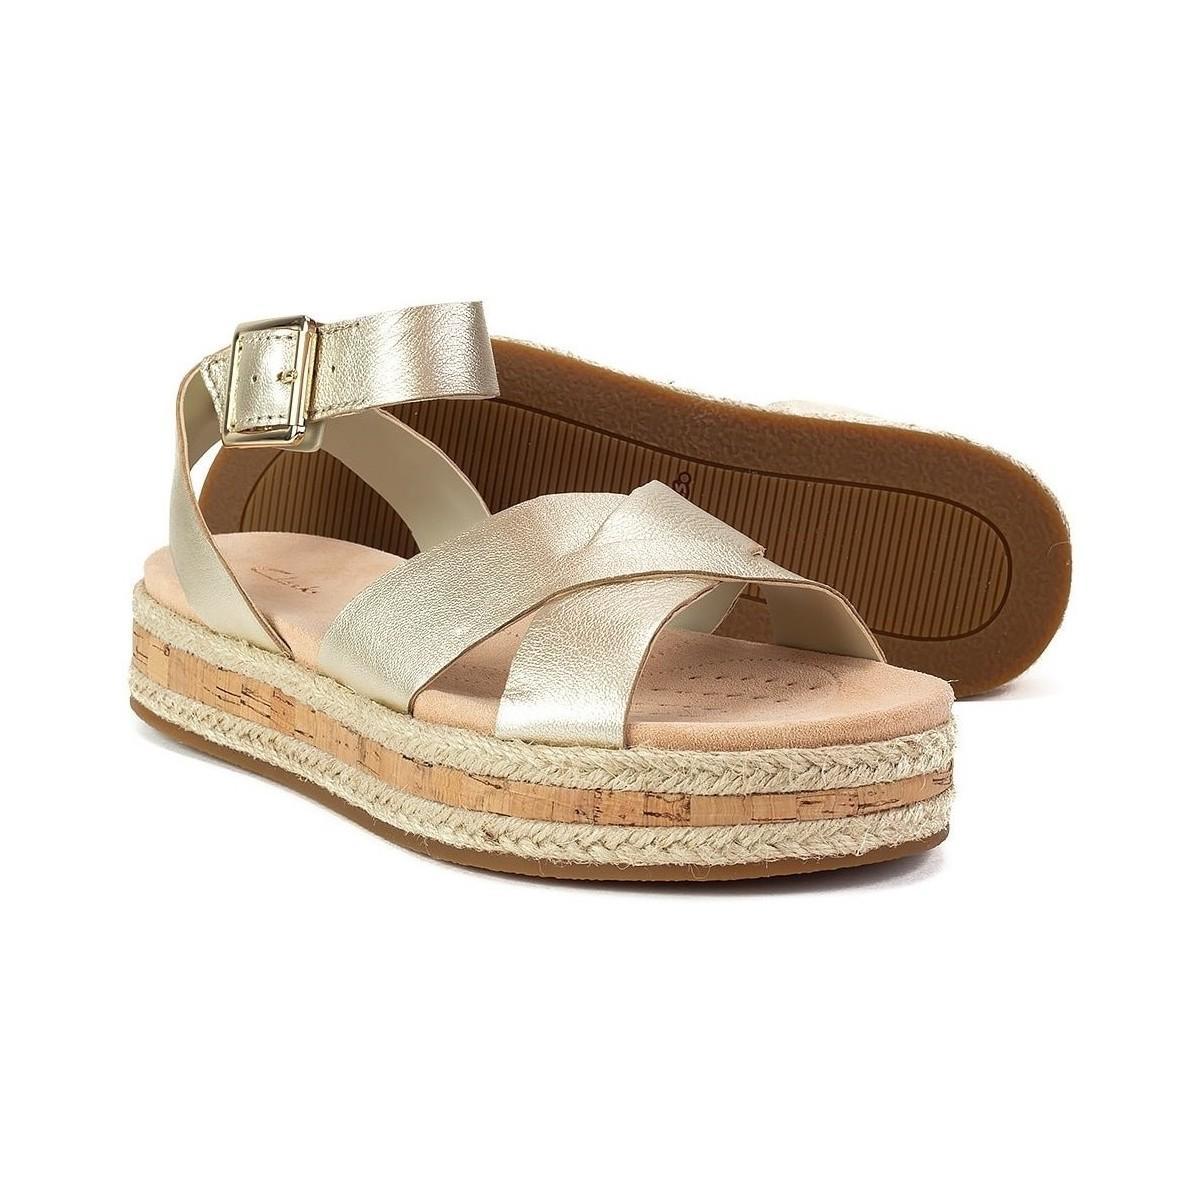 376a4c890317 Clarks - Metallic Botanic Poppy Women s Sandals In Gold - Lyst. View  fullscreen